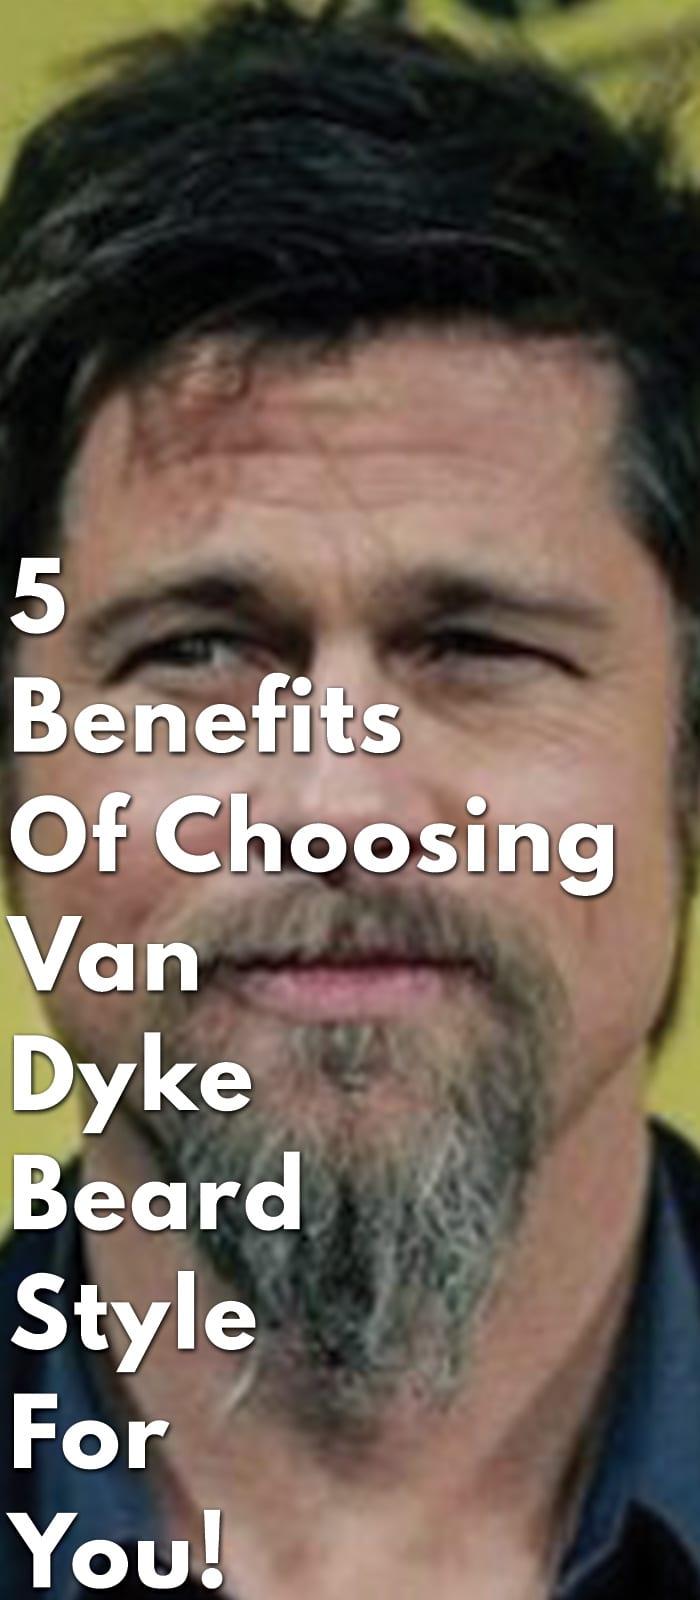 5-Benefits-Of-Choosing-Van-Dyke-Beard-Style-For-You!